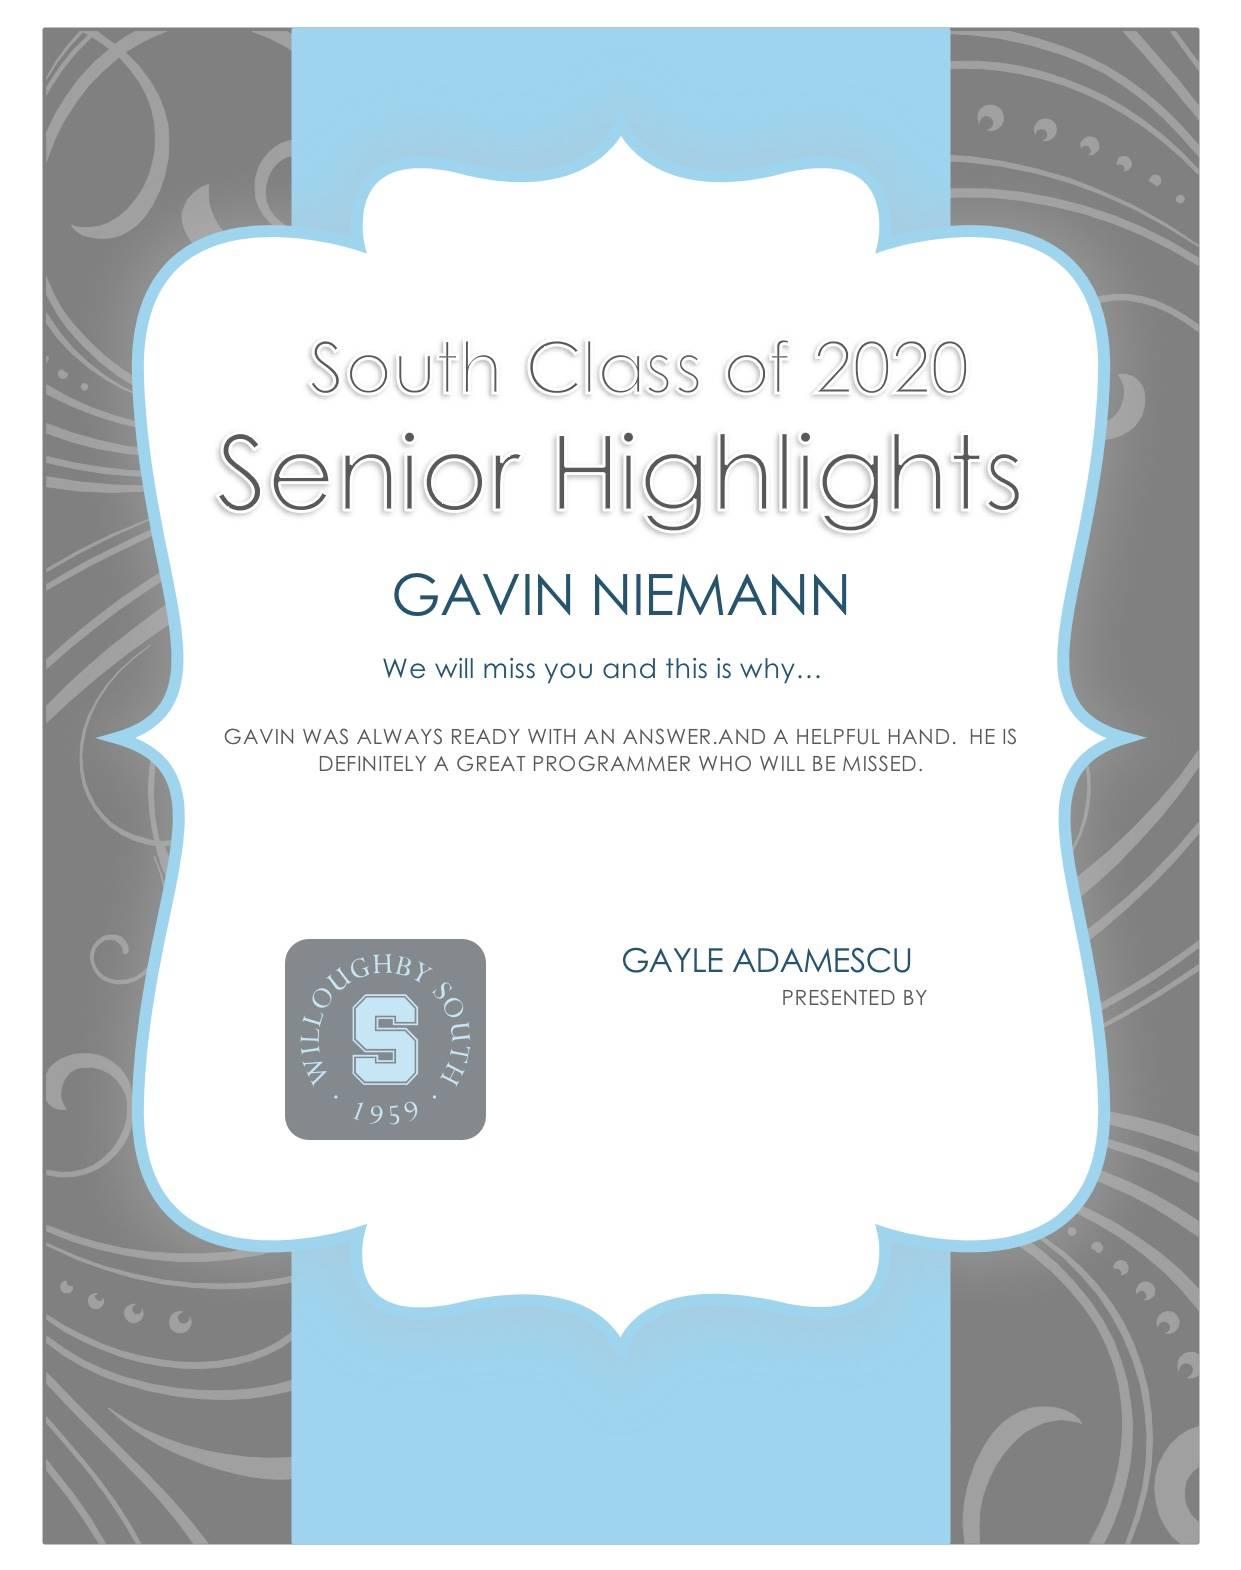 Gavin Neimann